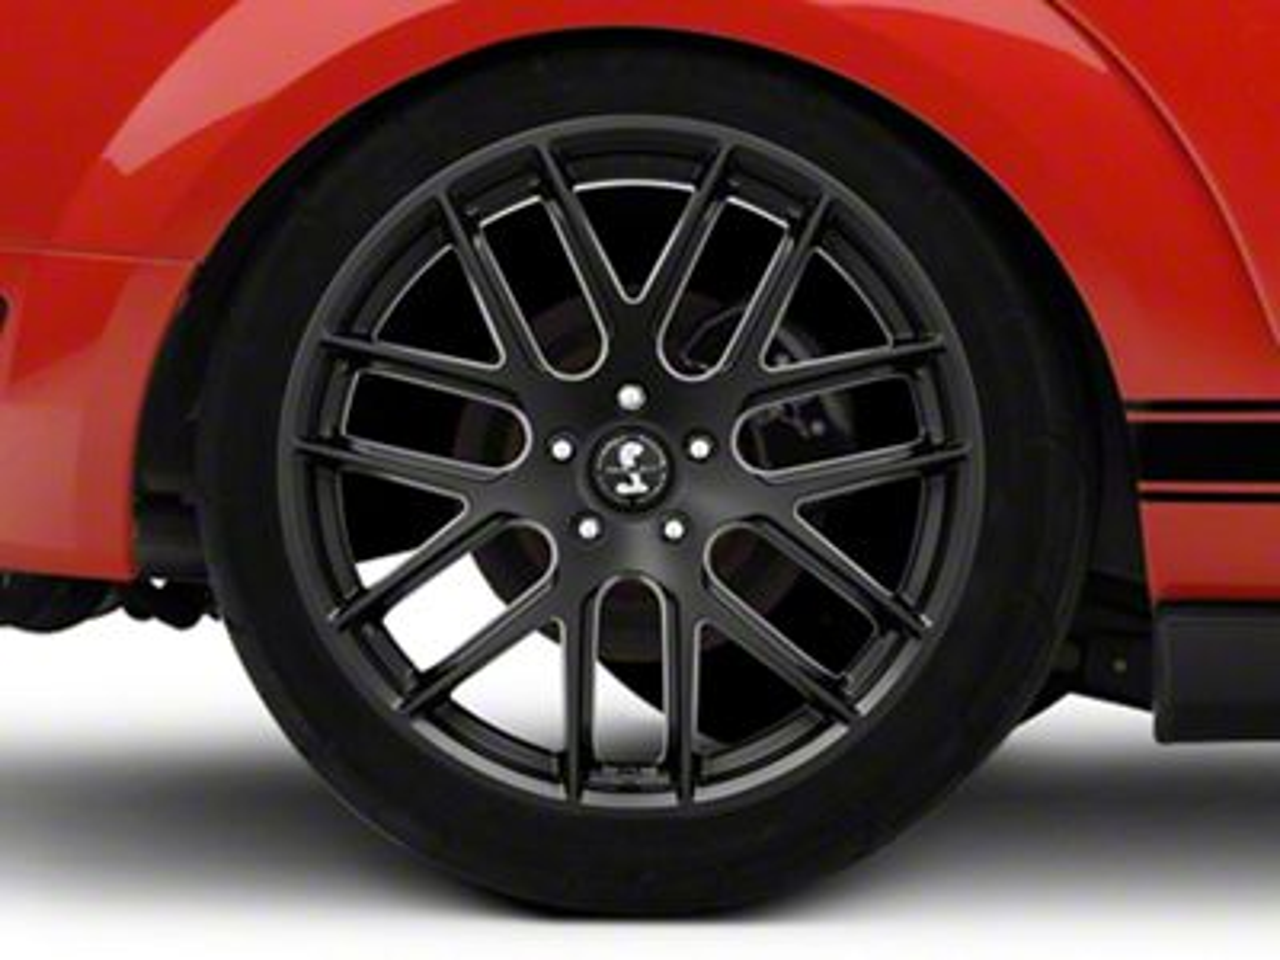 mustang shelby style sb202 satin black wheel 20x10 5 05 14 all 2005 F150 Raptor Wheels